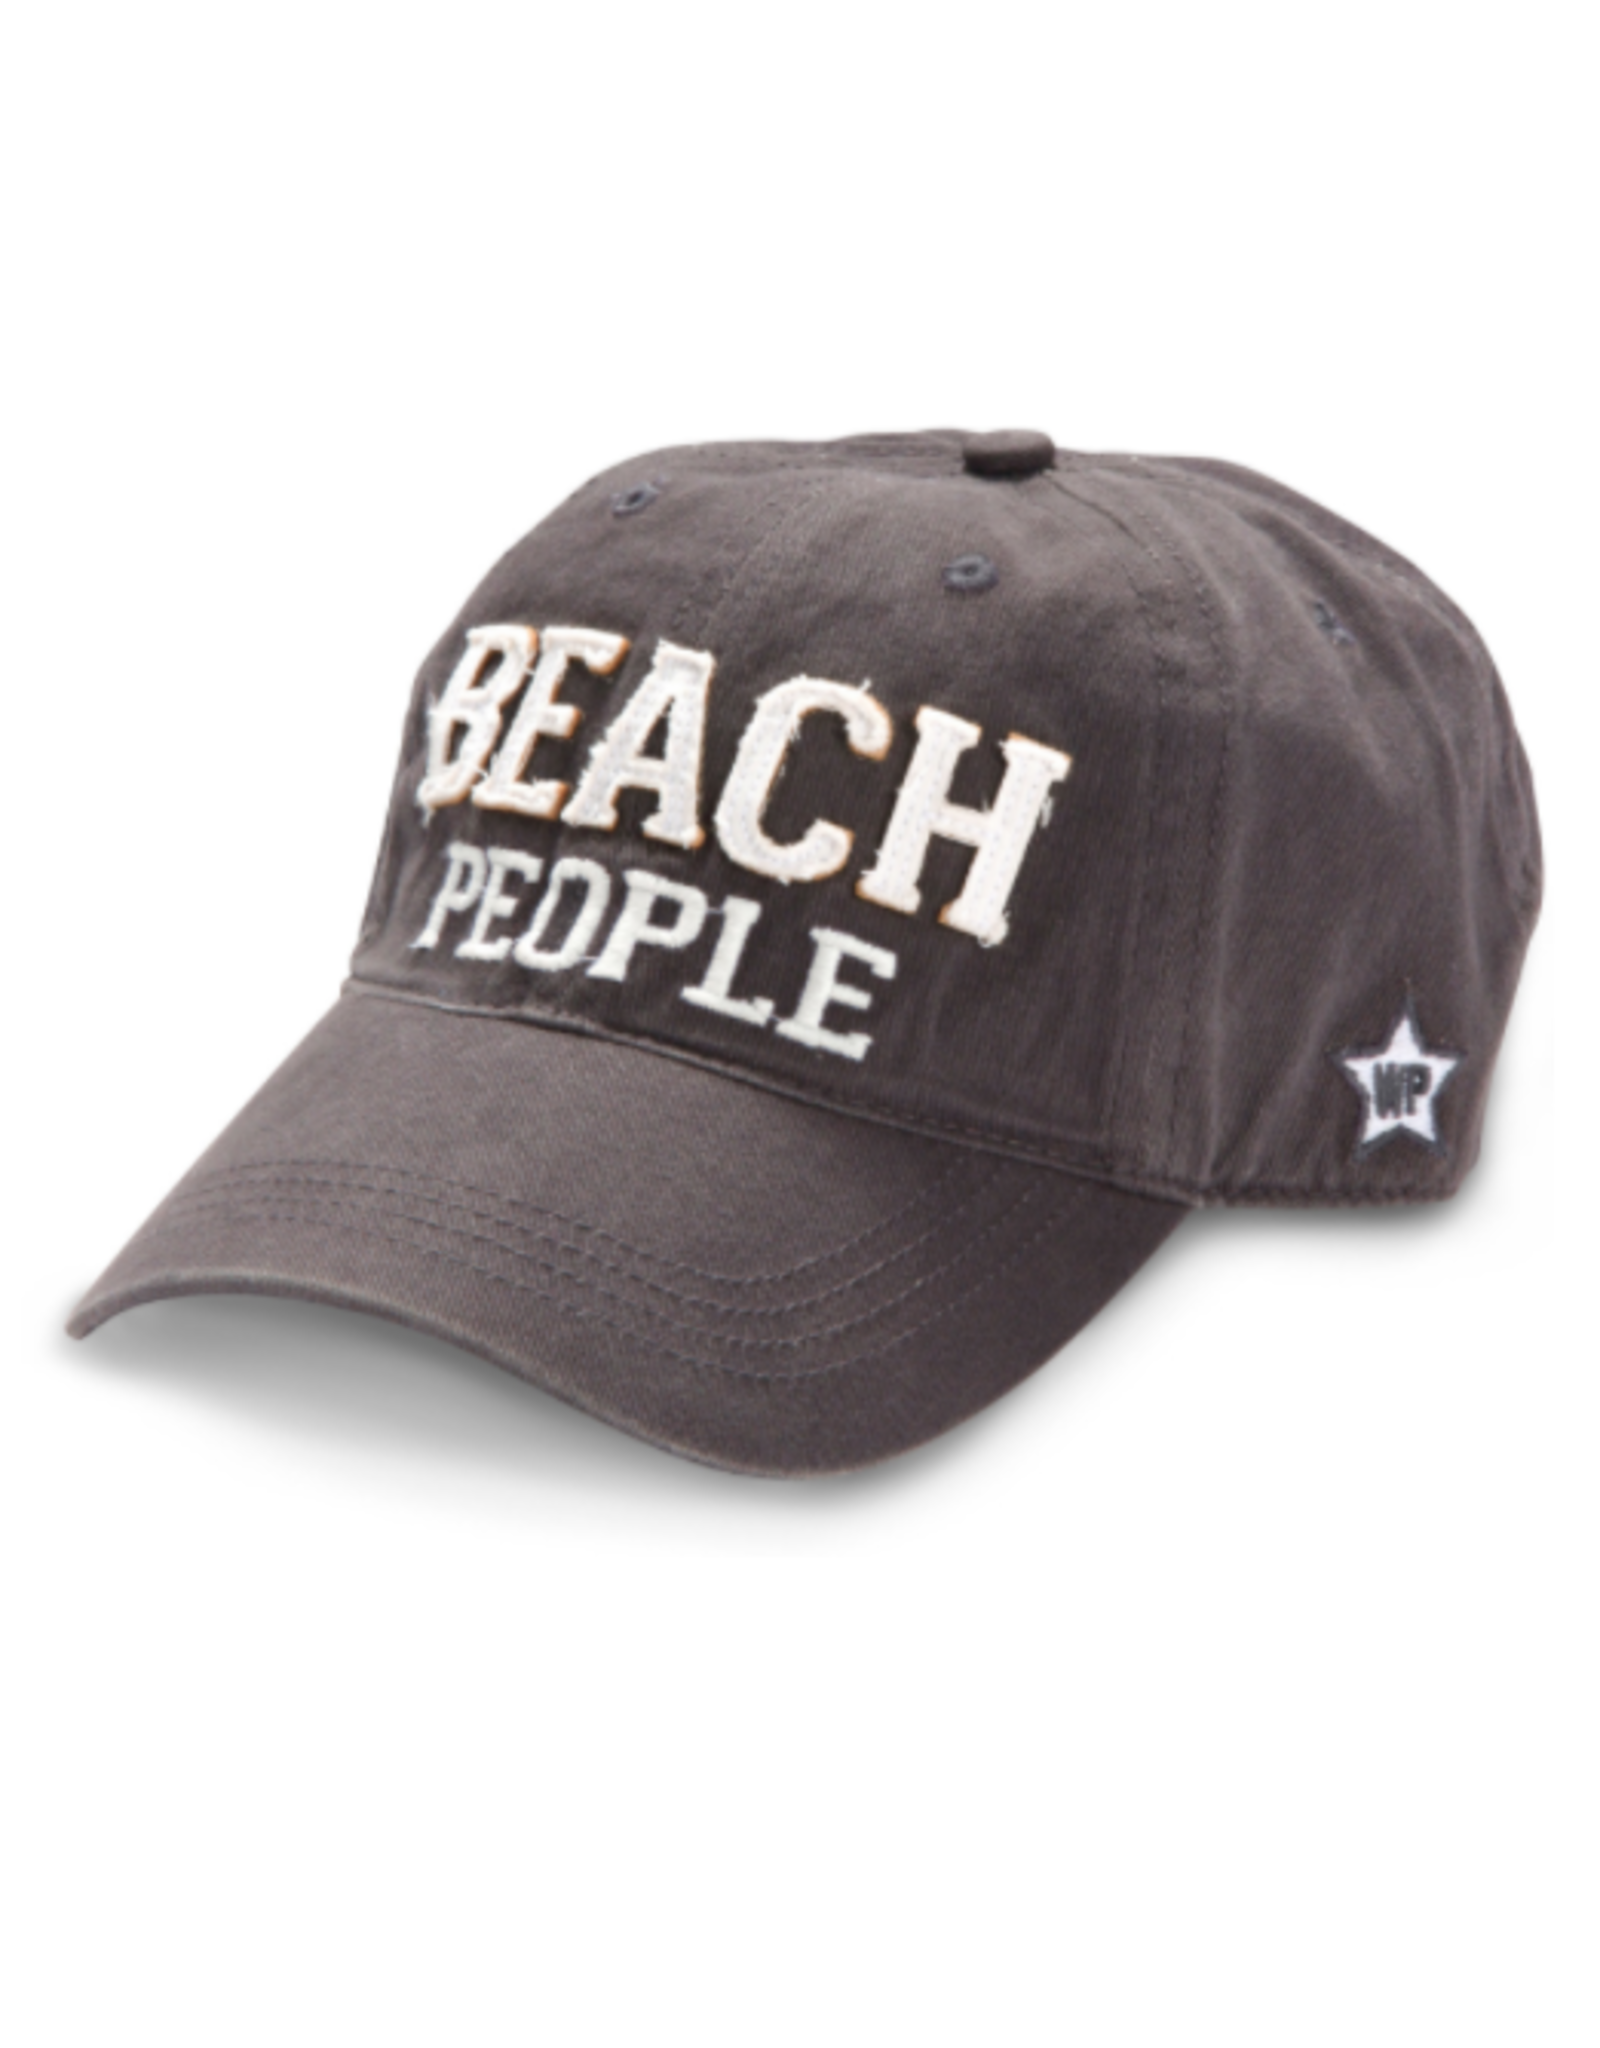 Beach People Ball Hat, grey